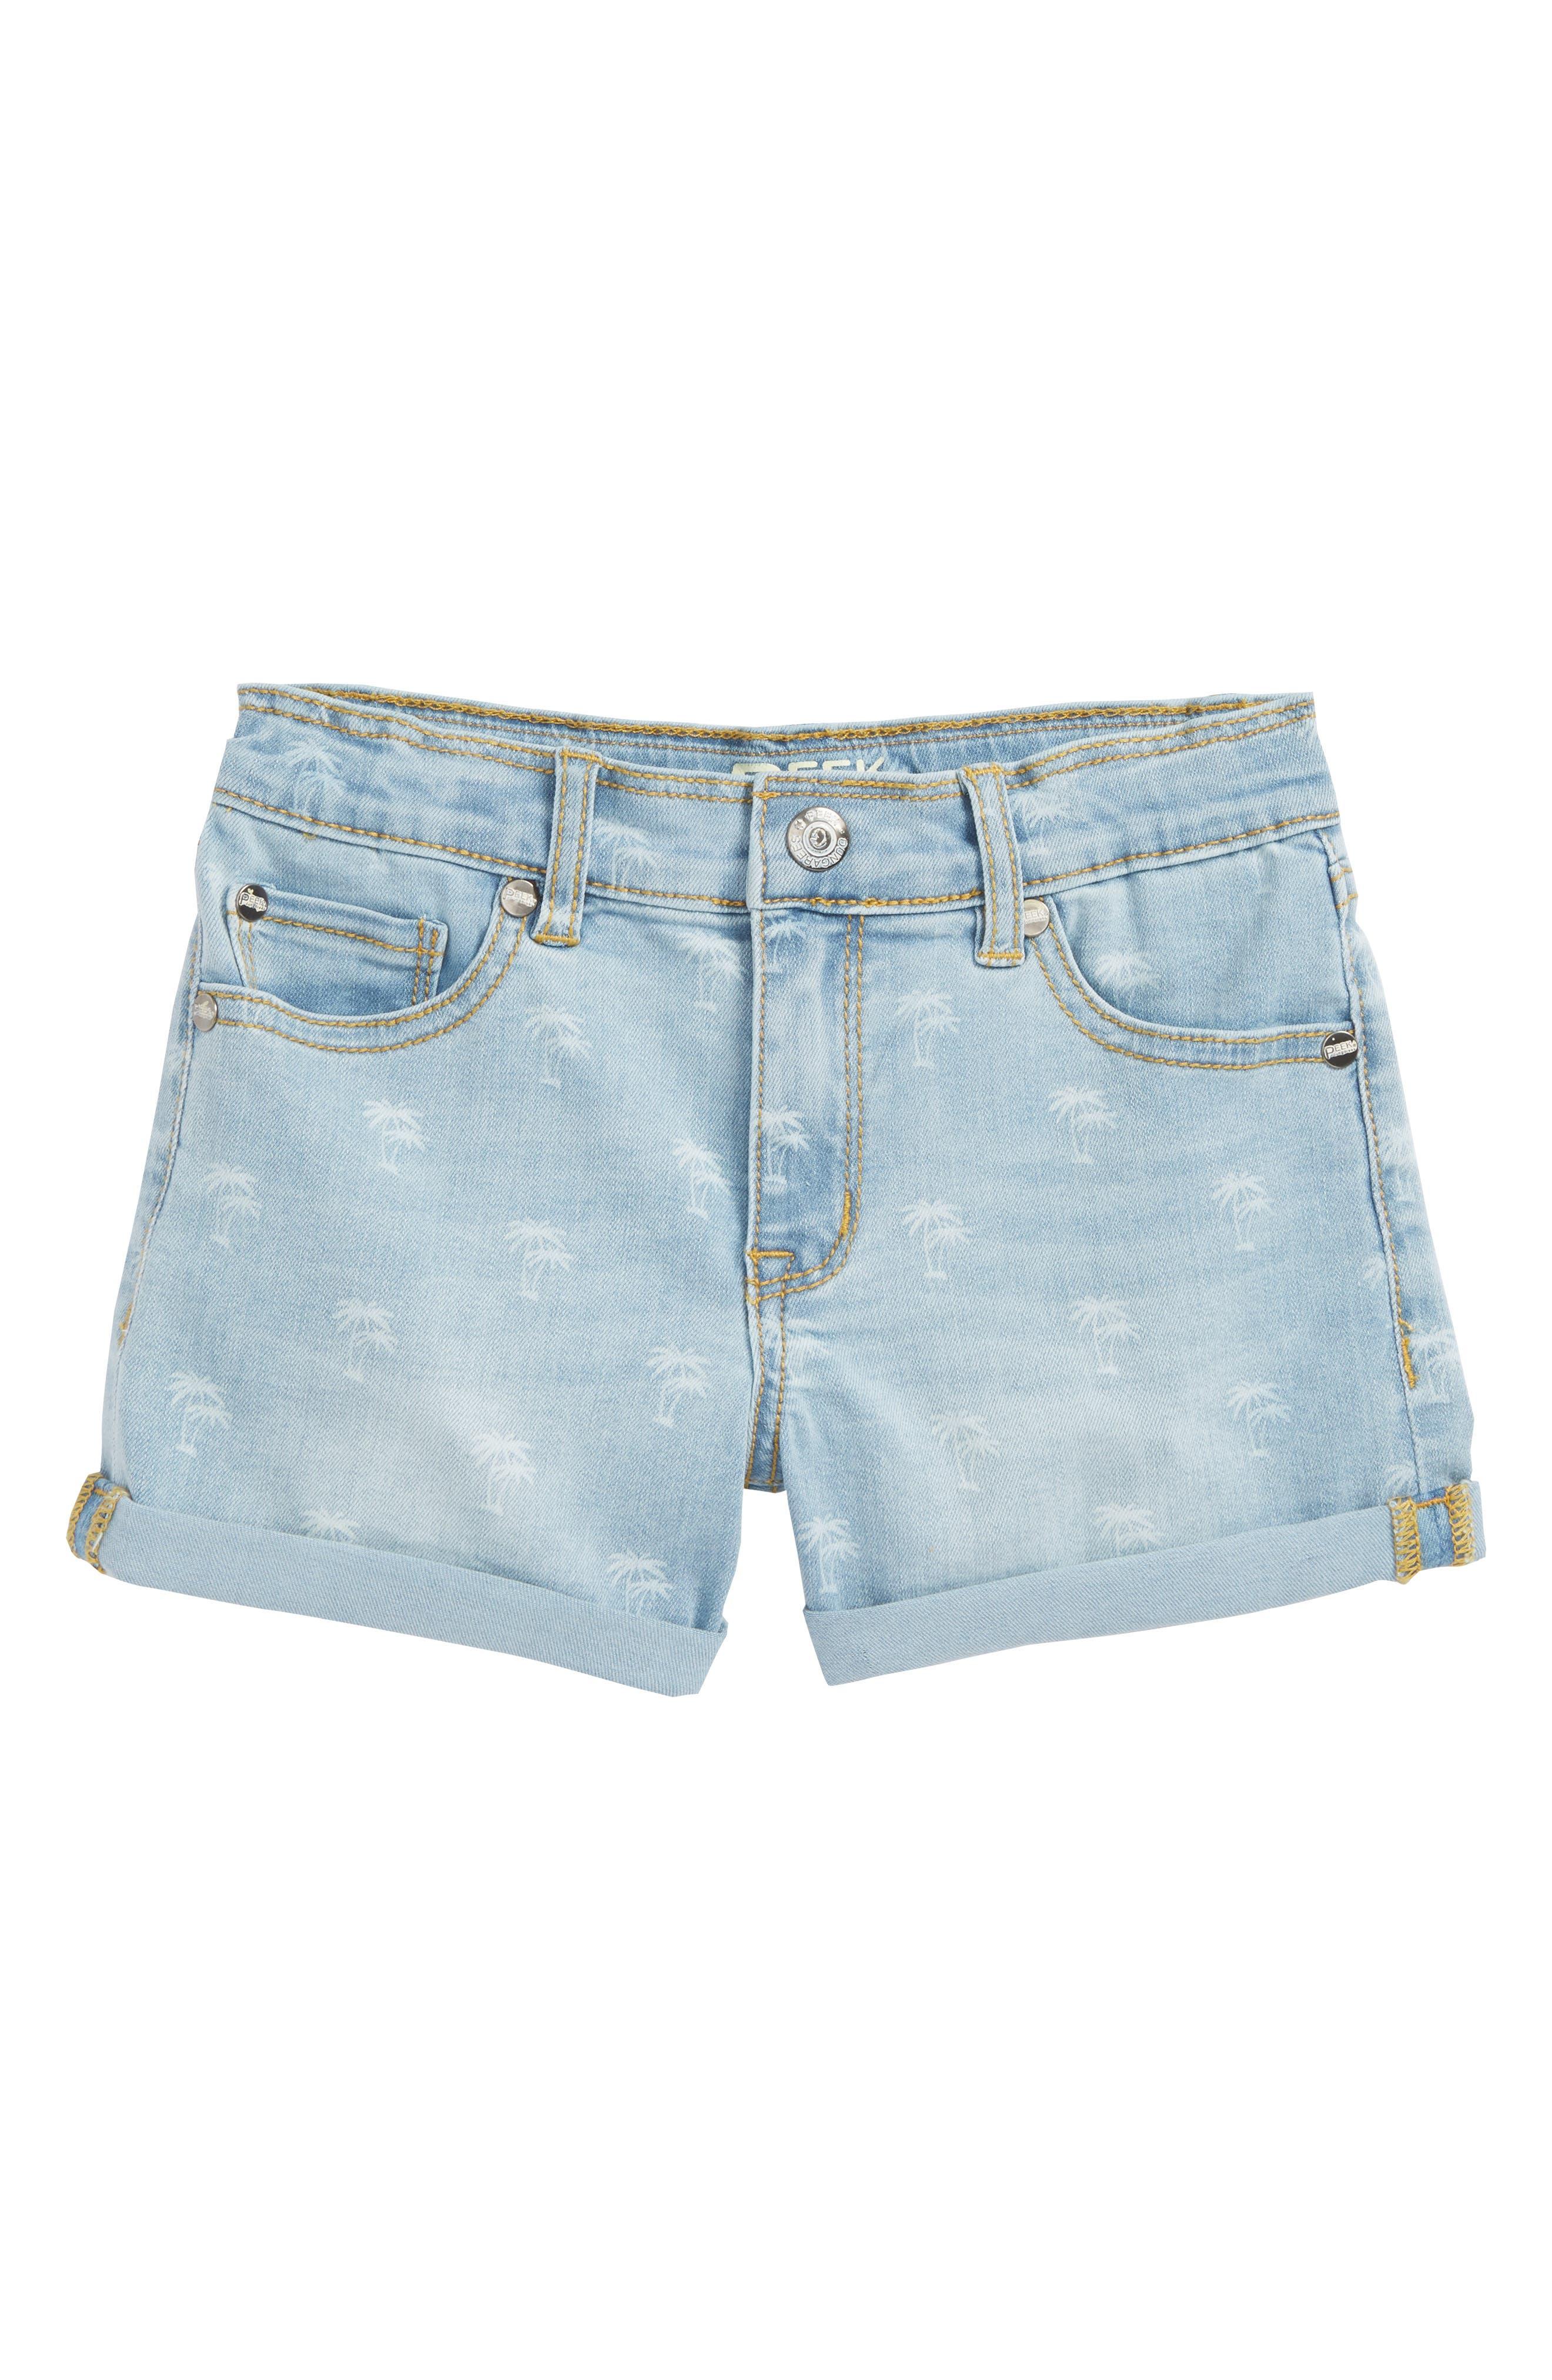 Griffin Palm Tree Denim Shorts,                         Main,                         color, 451